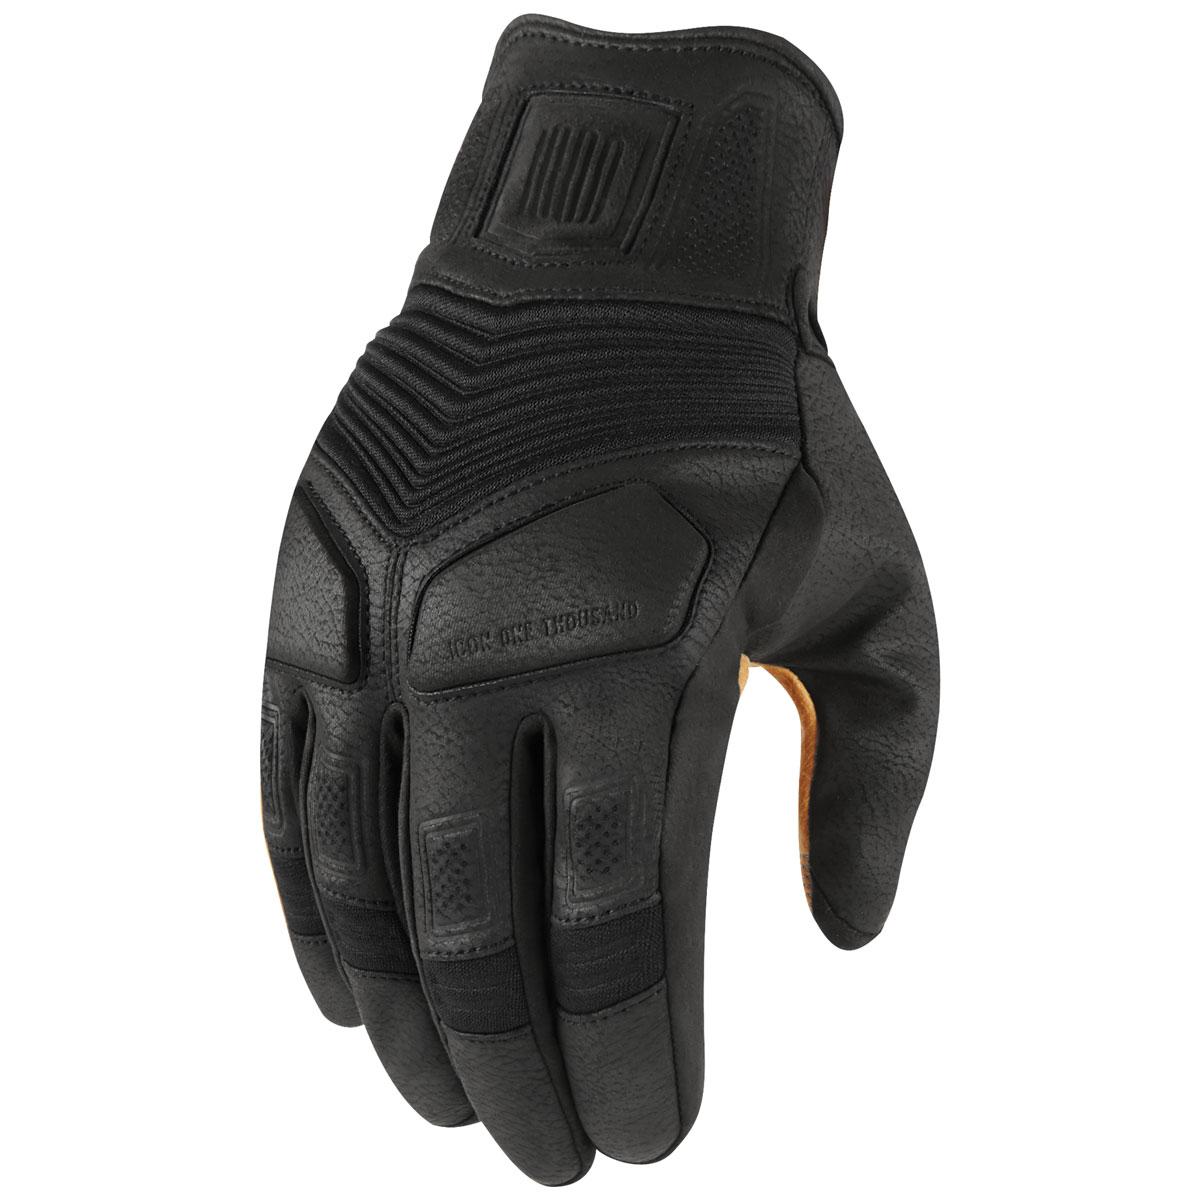 ICON One Thousand Men's Nightbreed Black Gloves